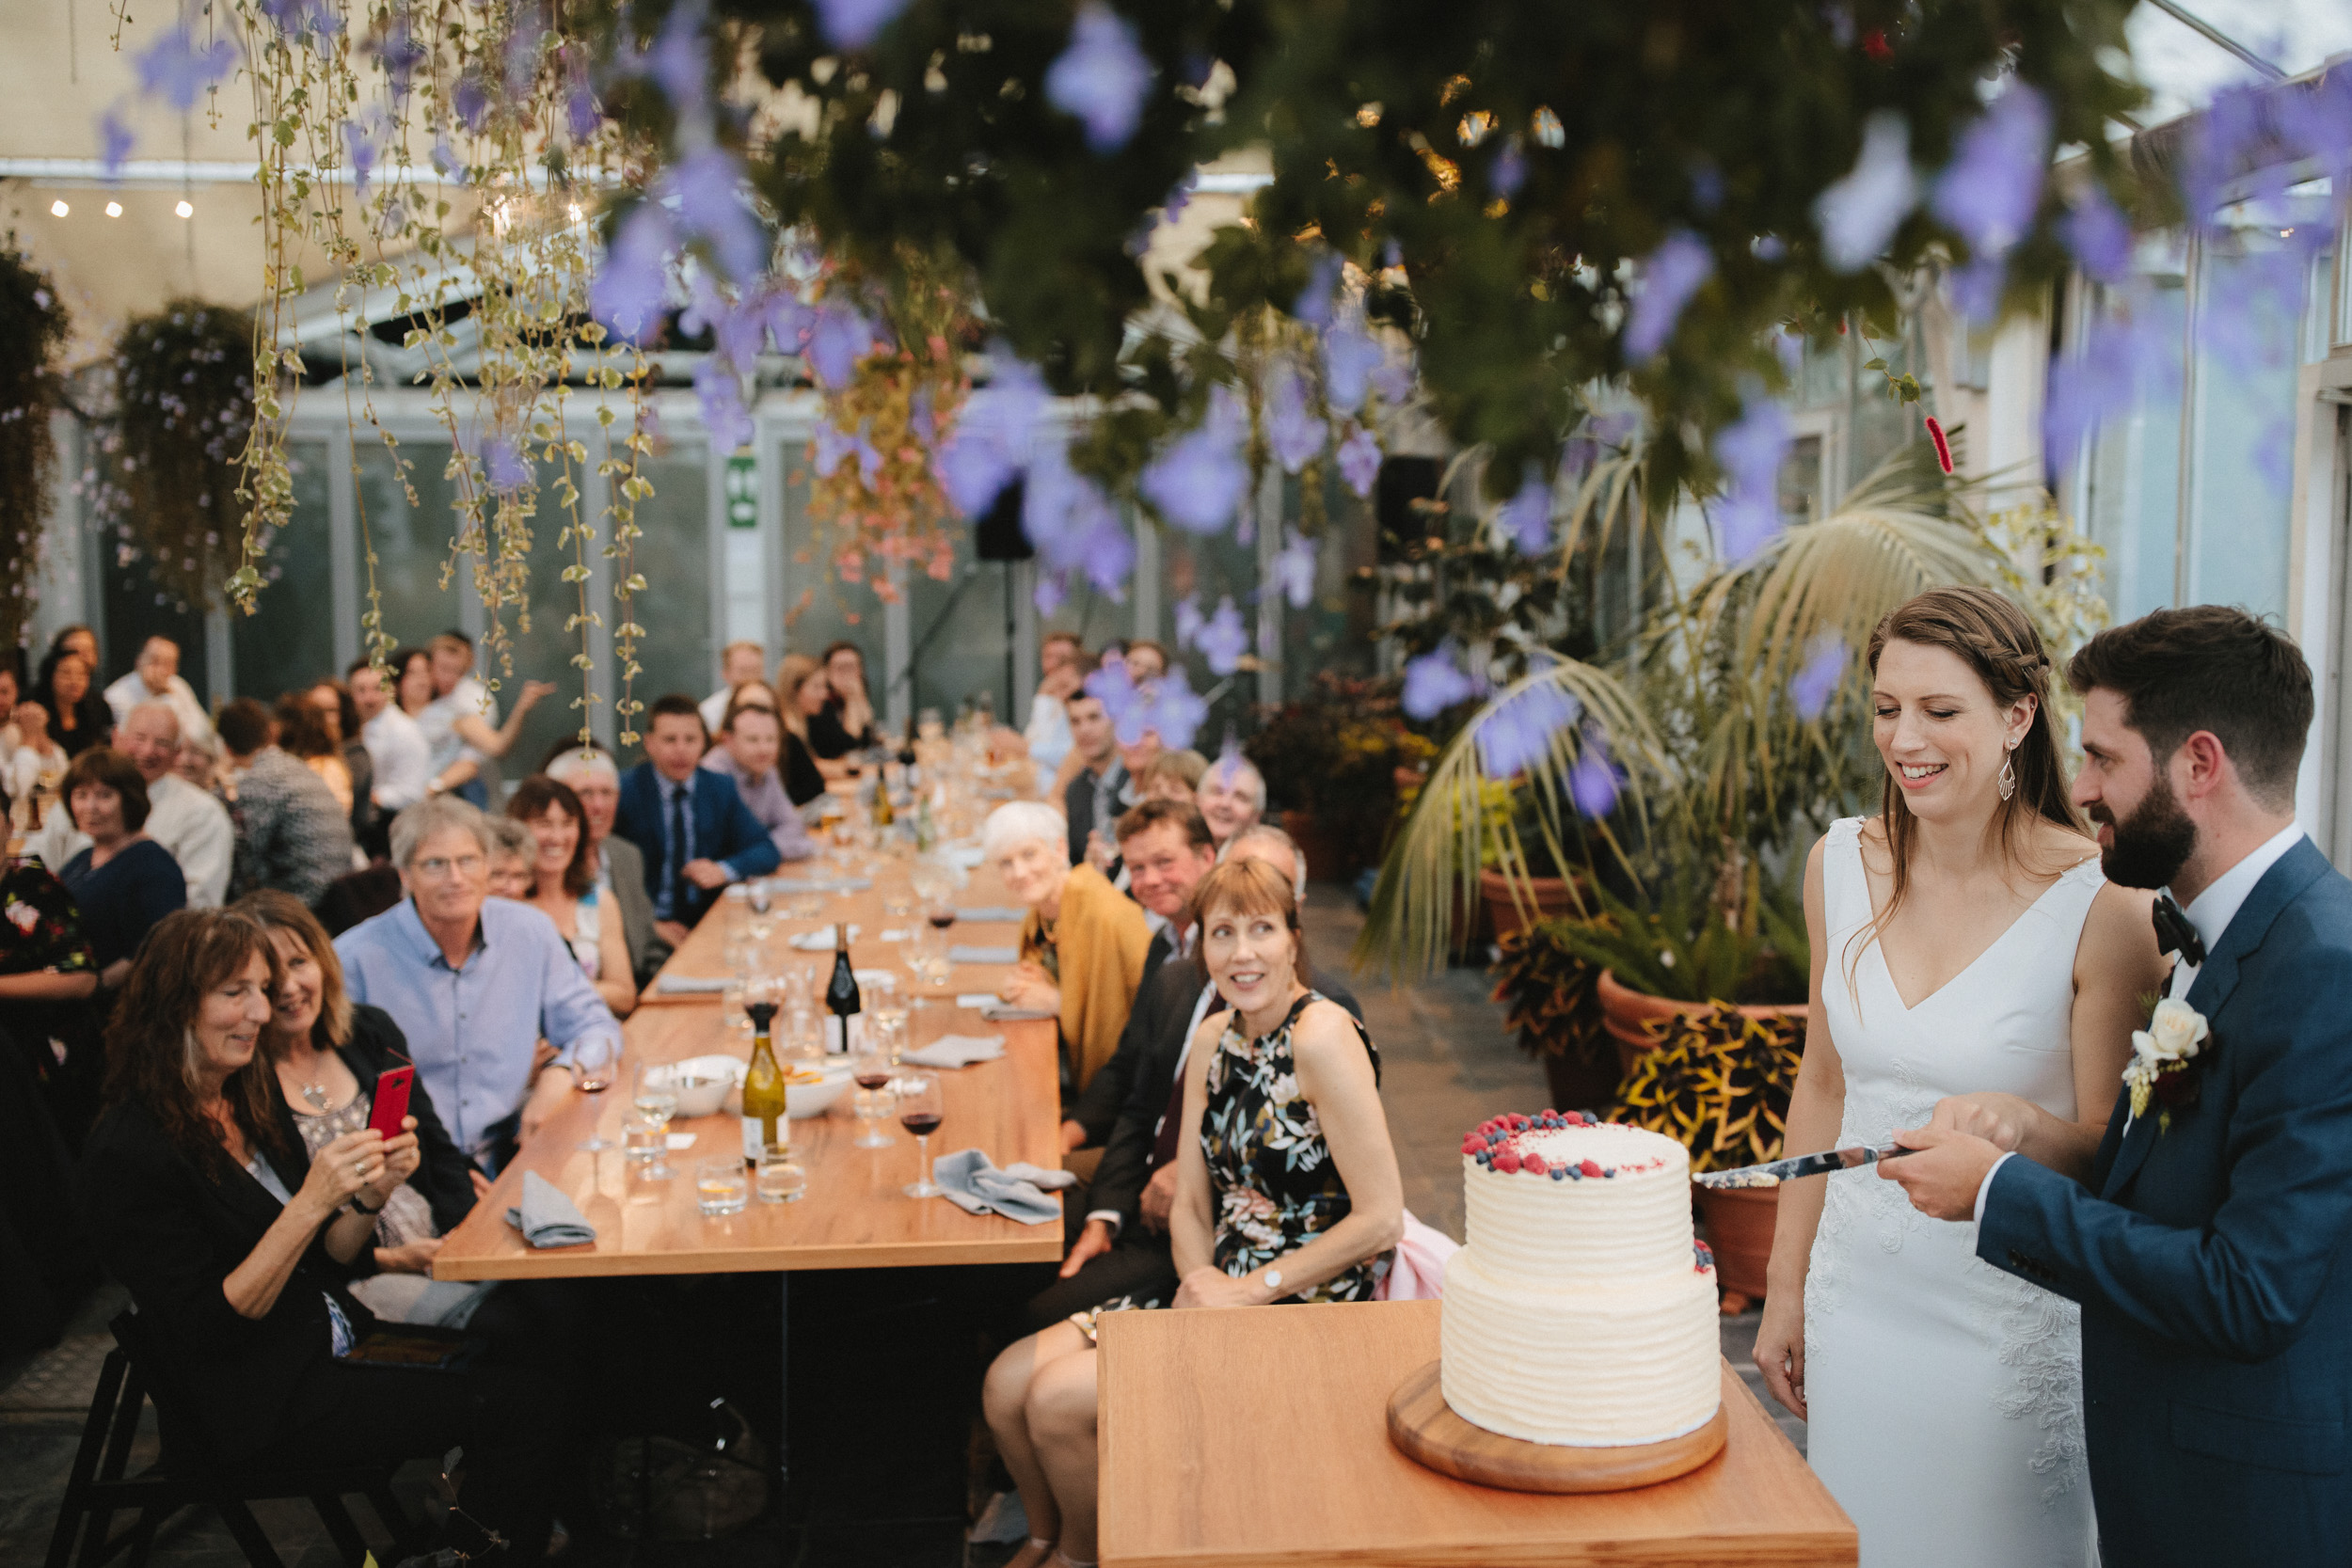 Couple cut their cake at their Botanic Garden wedding